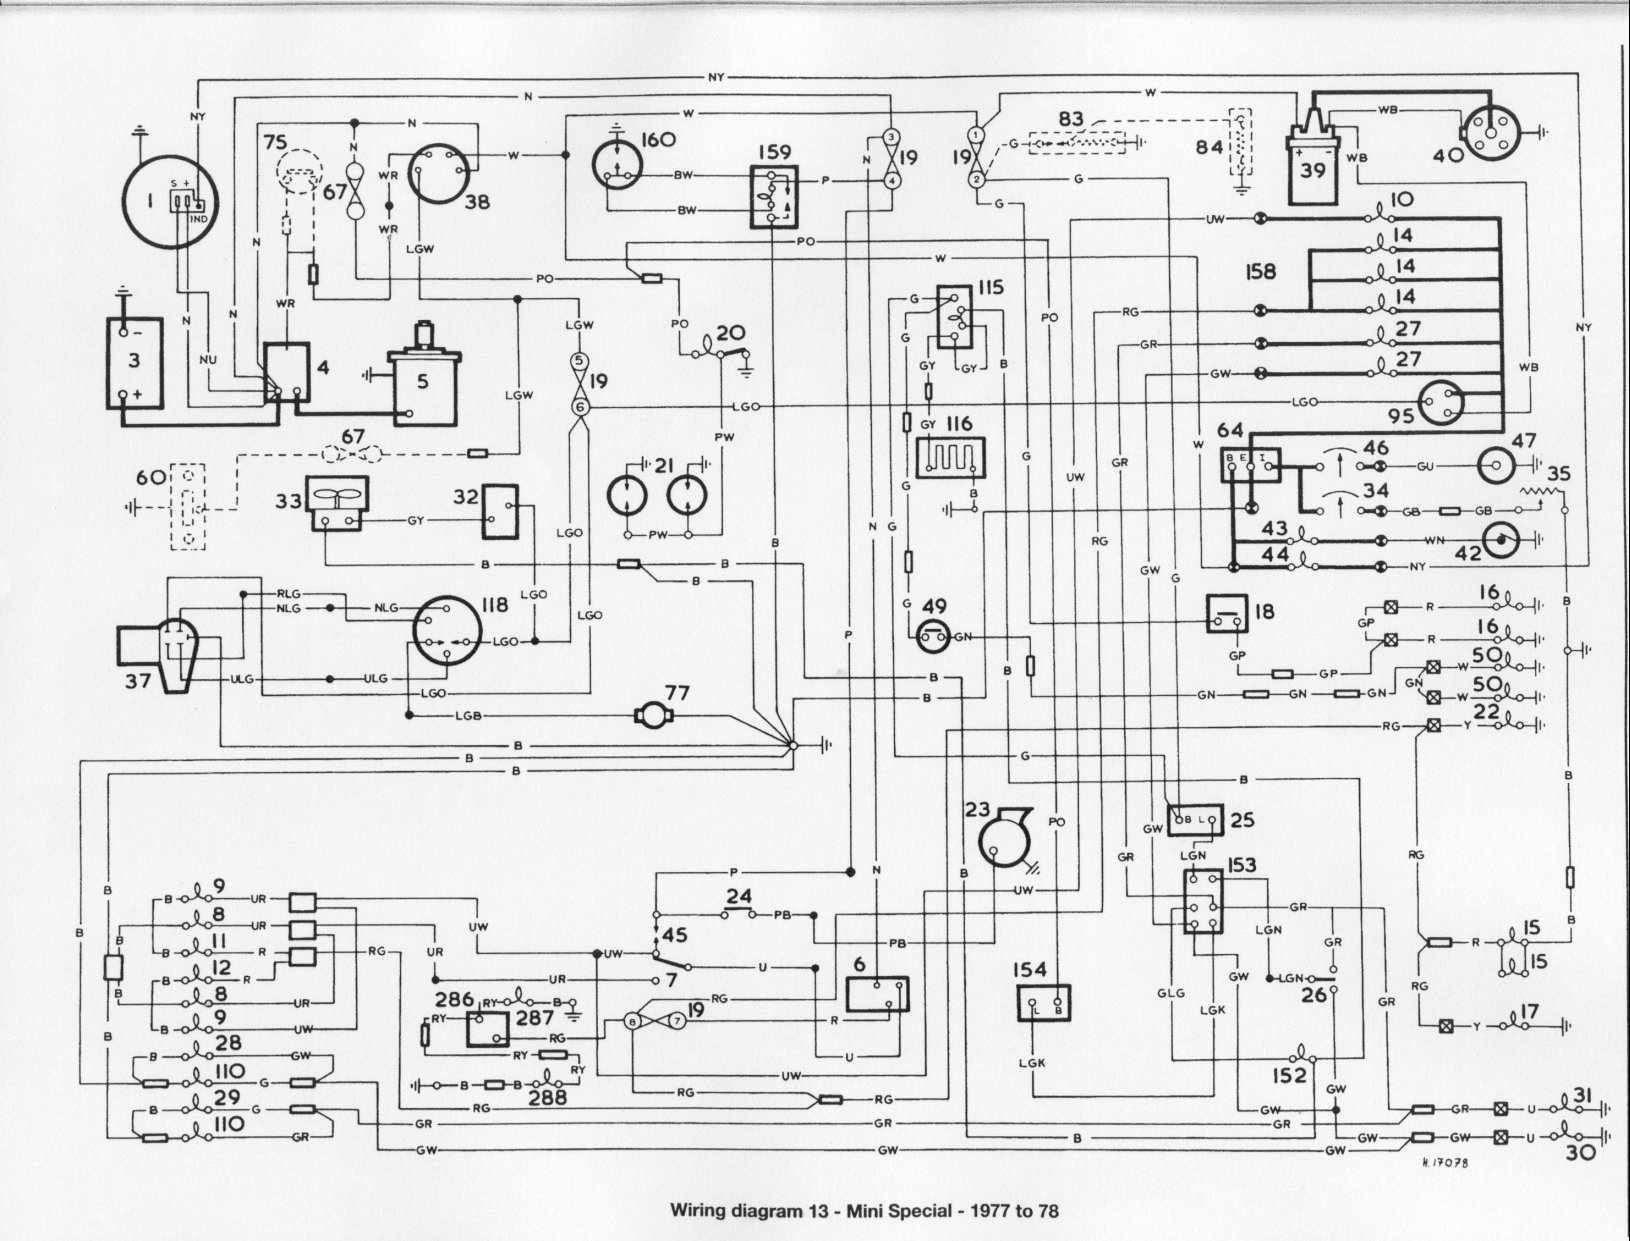 Mitsubishi Fuso Wiring Diagrams